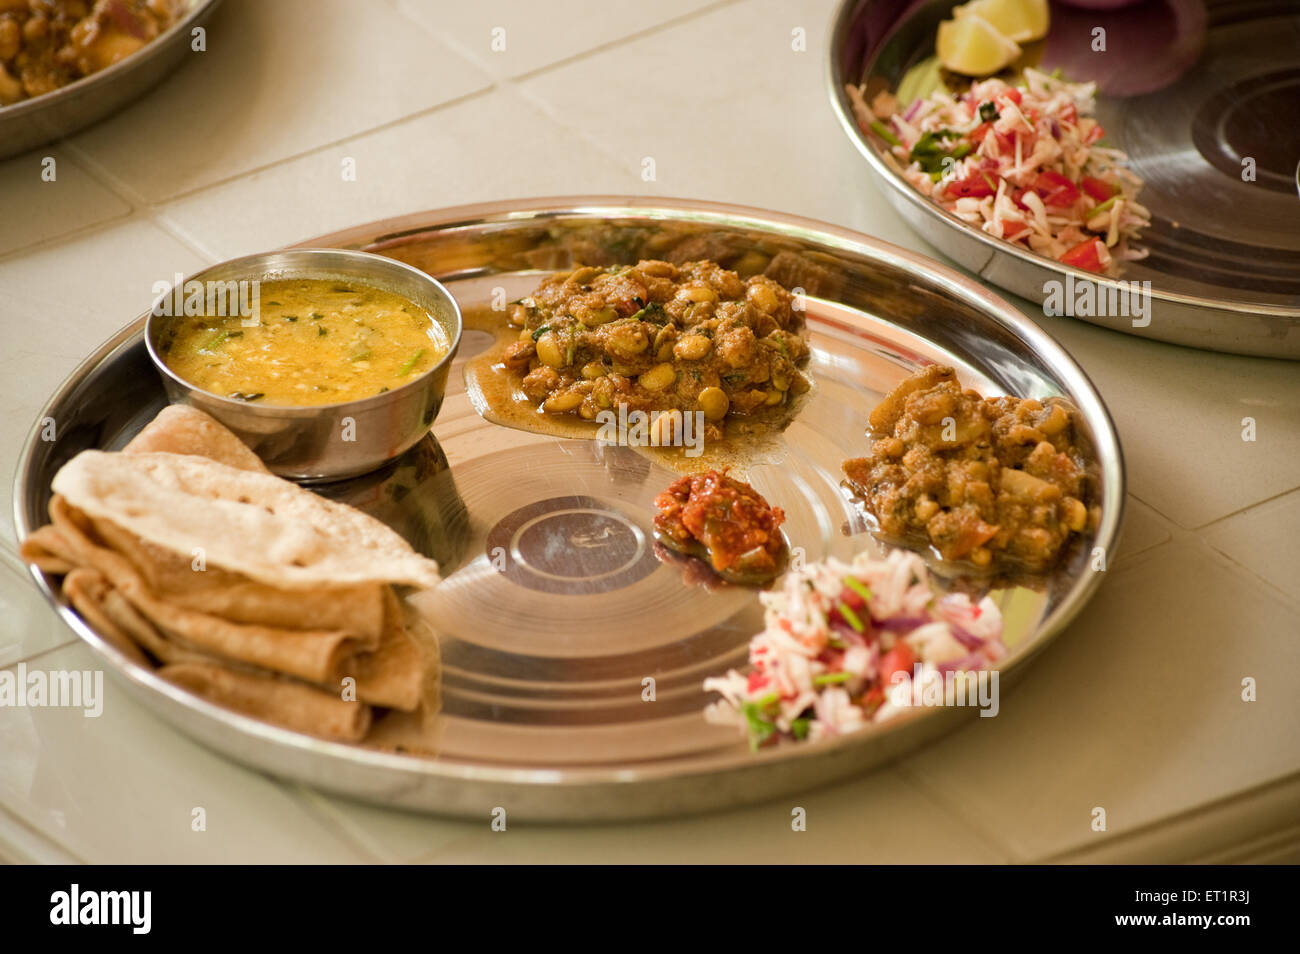 Konkani vegetarian thali Stock Photo: 83633302 - Alamy